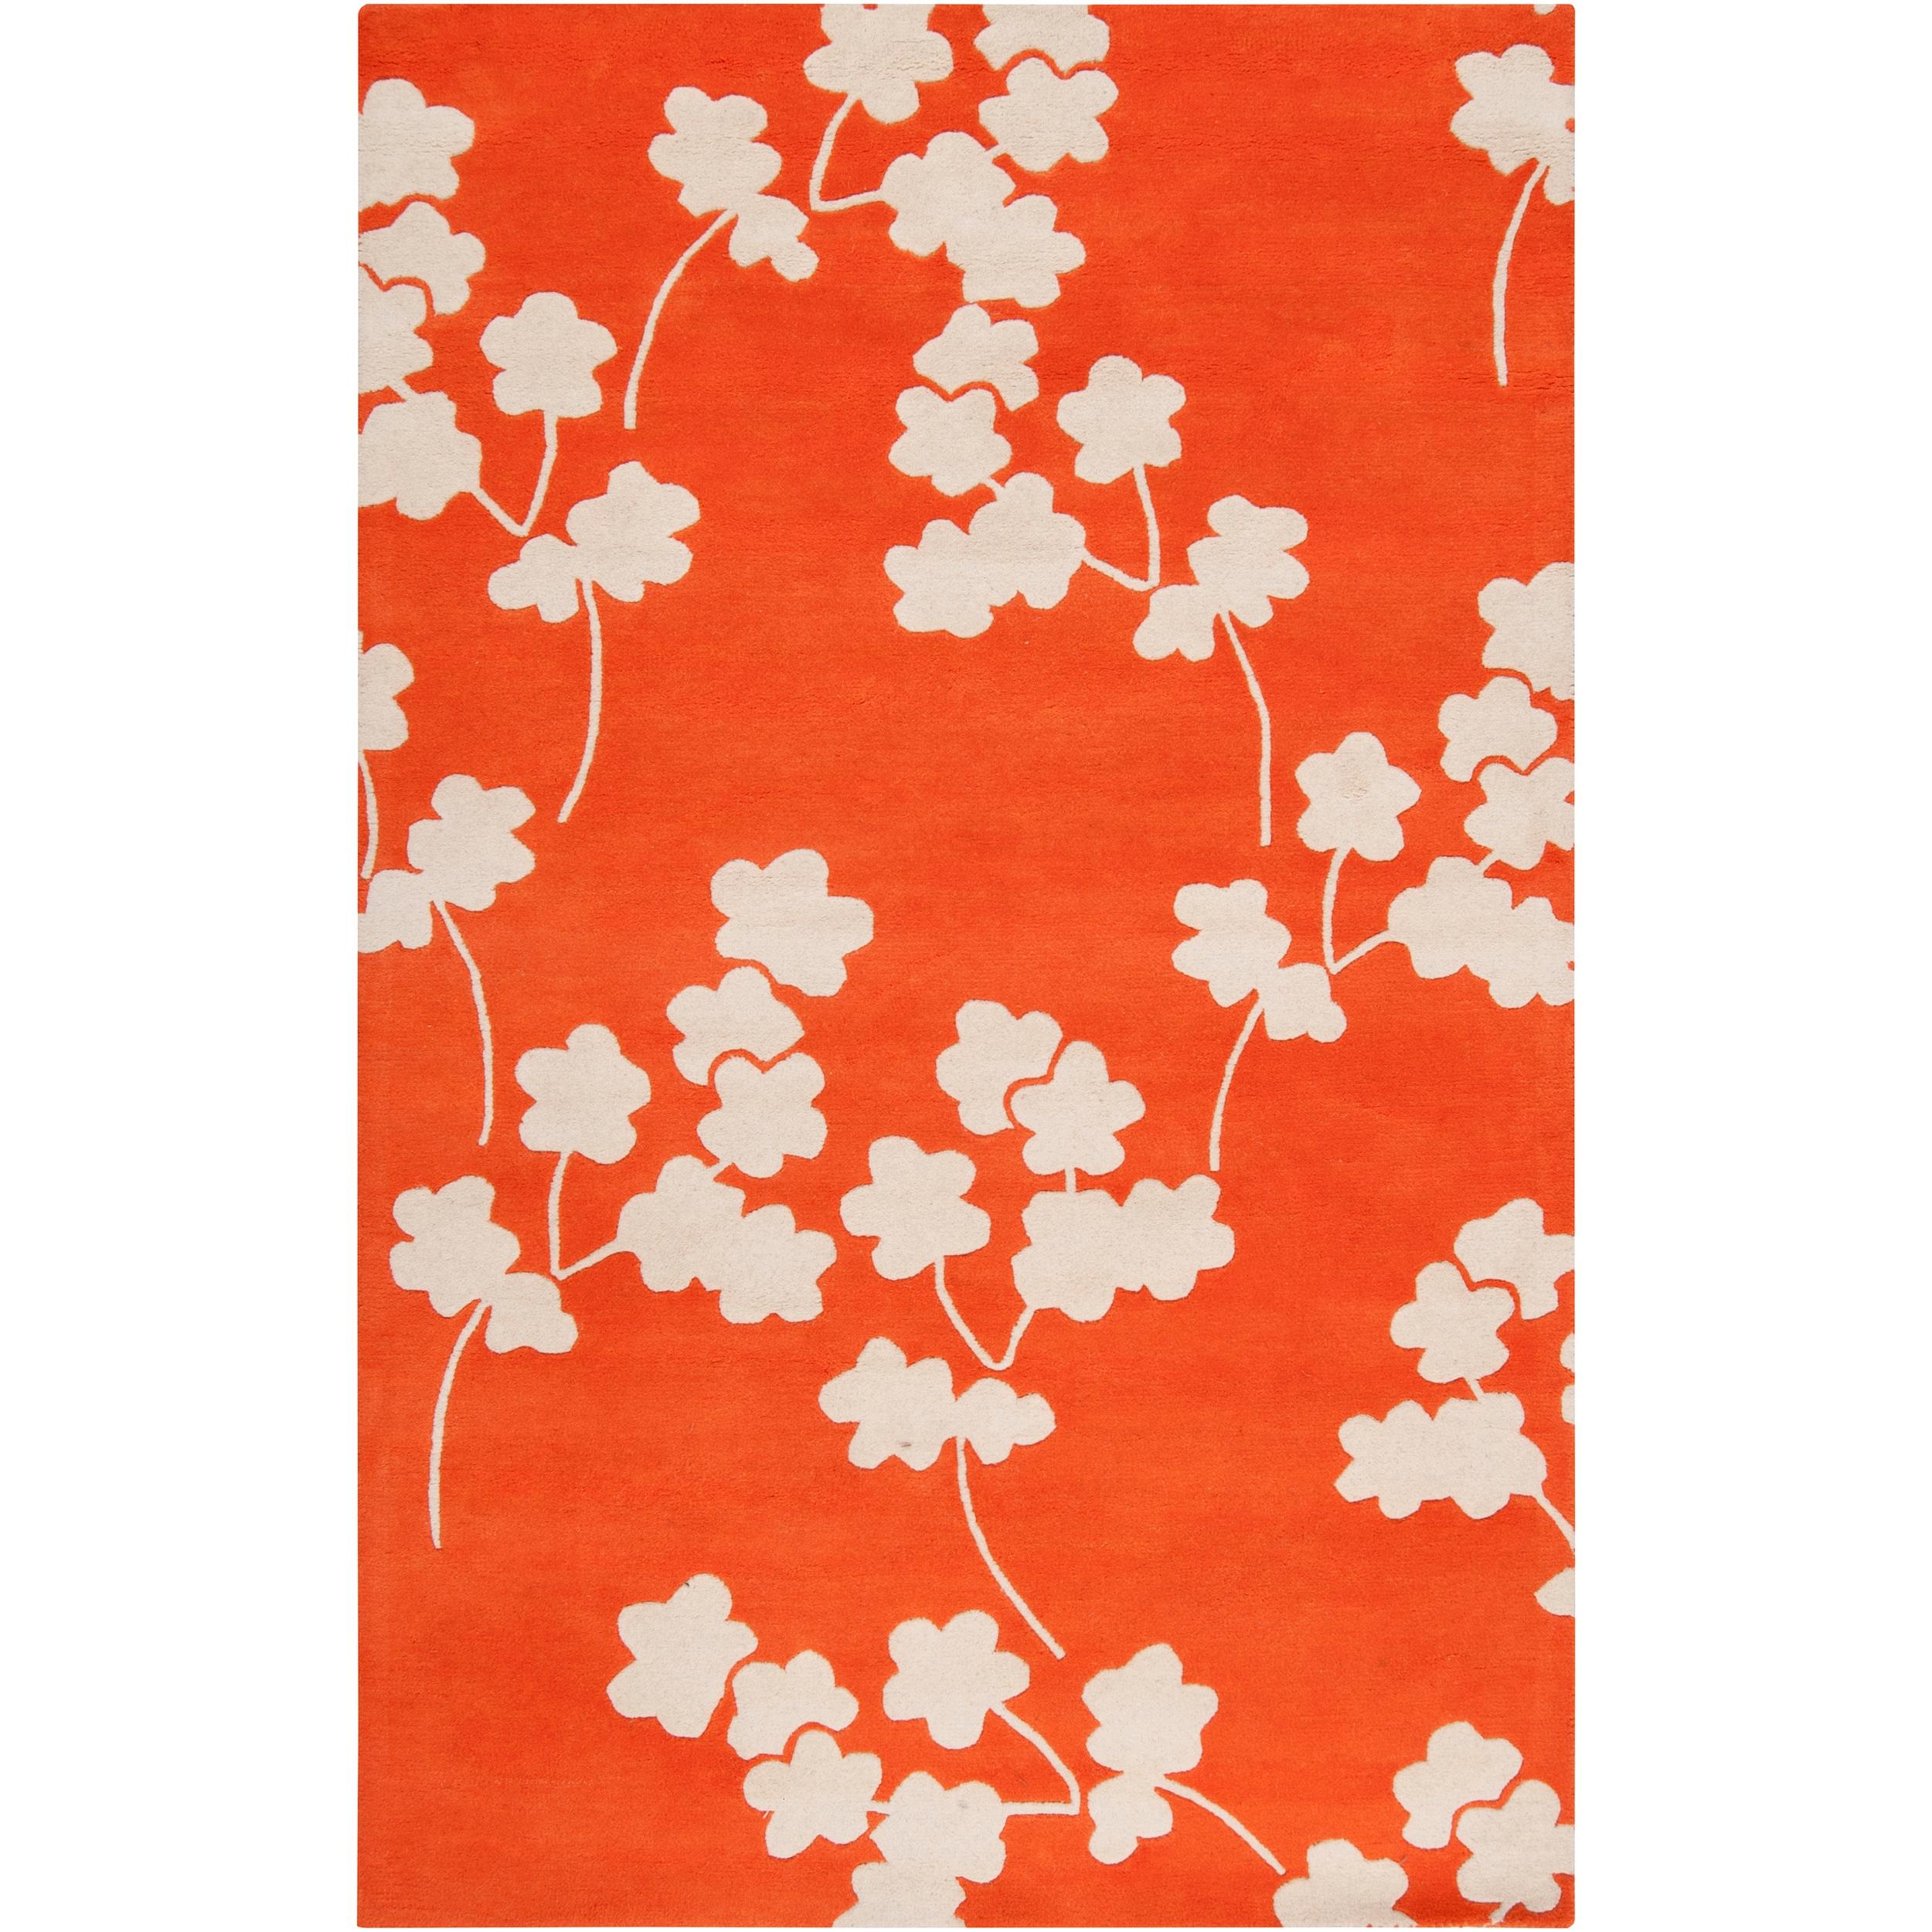 Jill Rosenwald Hand-tufted Orange Reelan Floral Wool Rug (5' x 8')